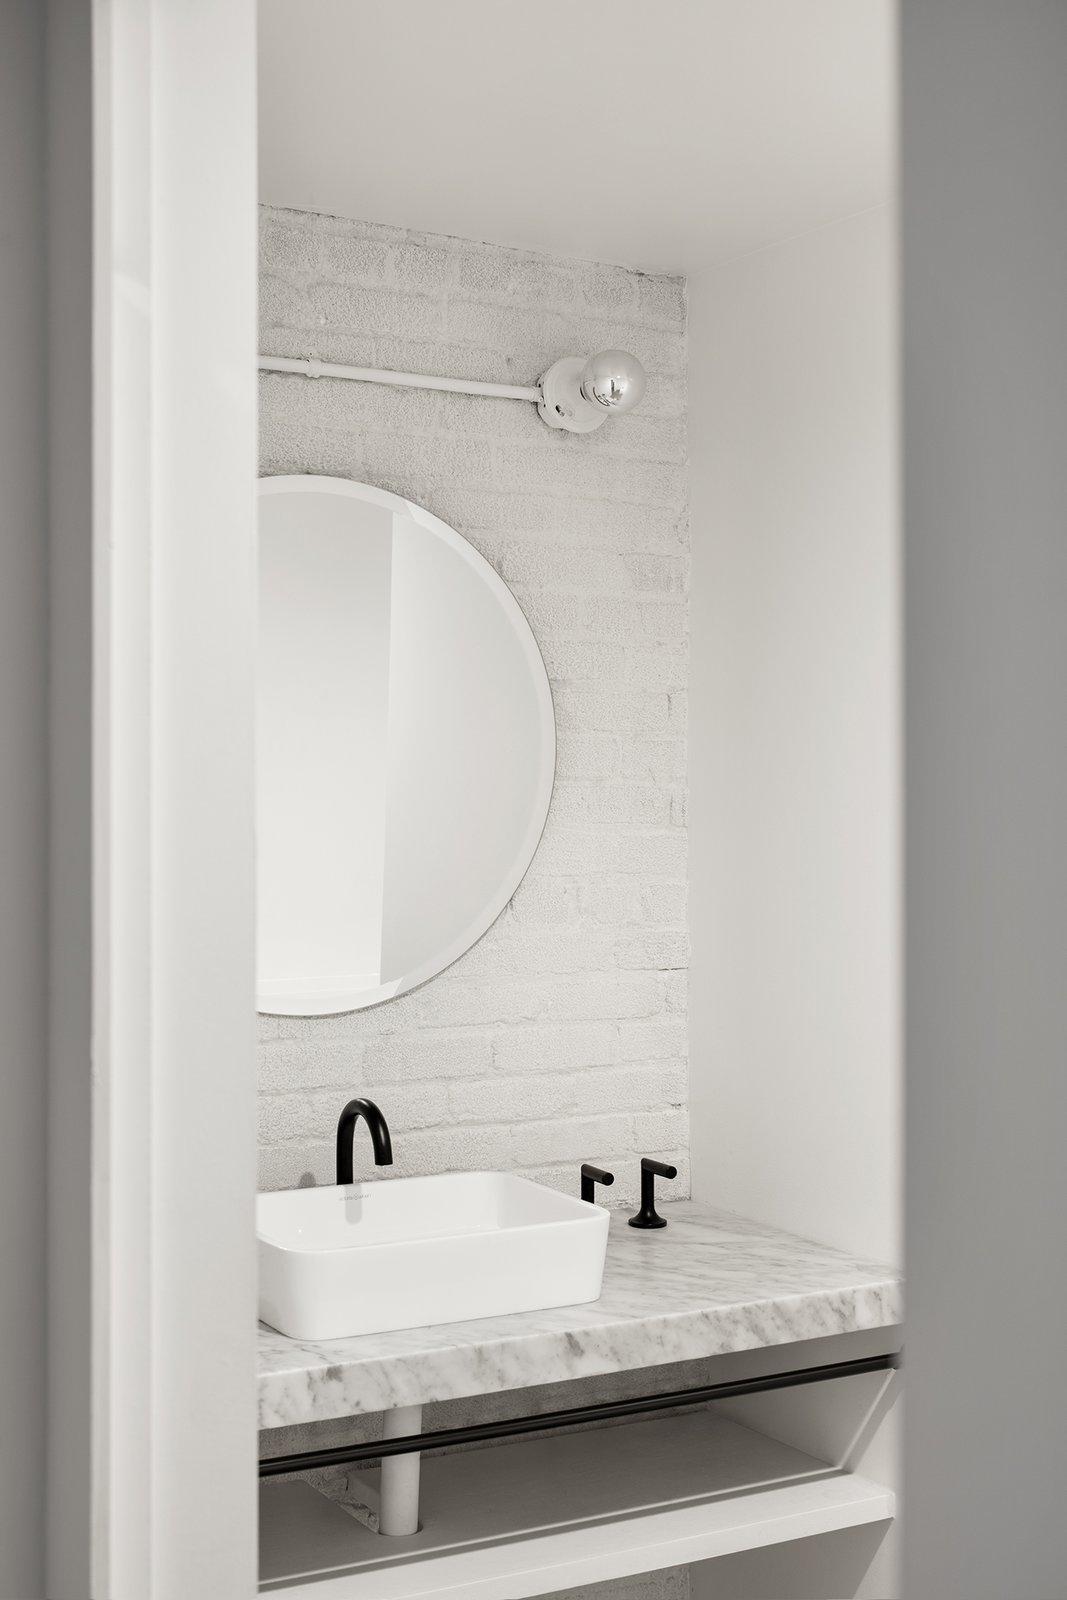 Bath Room, Concrete Floor, Marble Floor, Marble Counter, Vessel Sink, Recessed Lighting, and Wall Lighting  Saint-Laurent Apartment by Atelier Barda